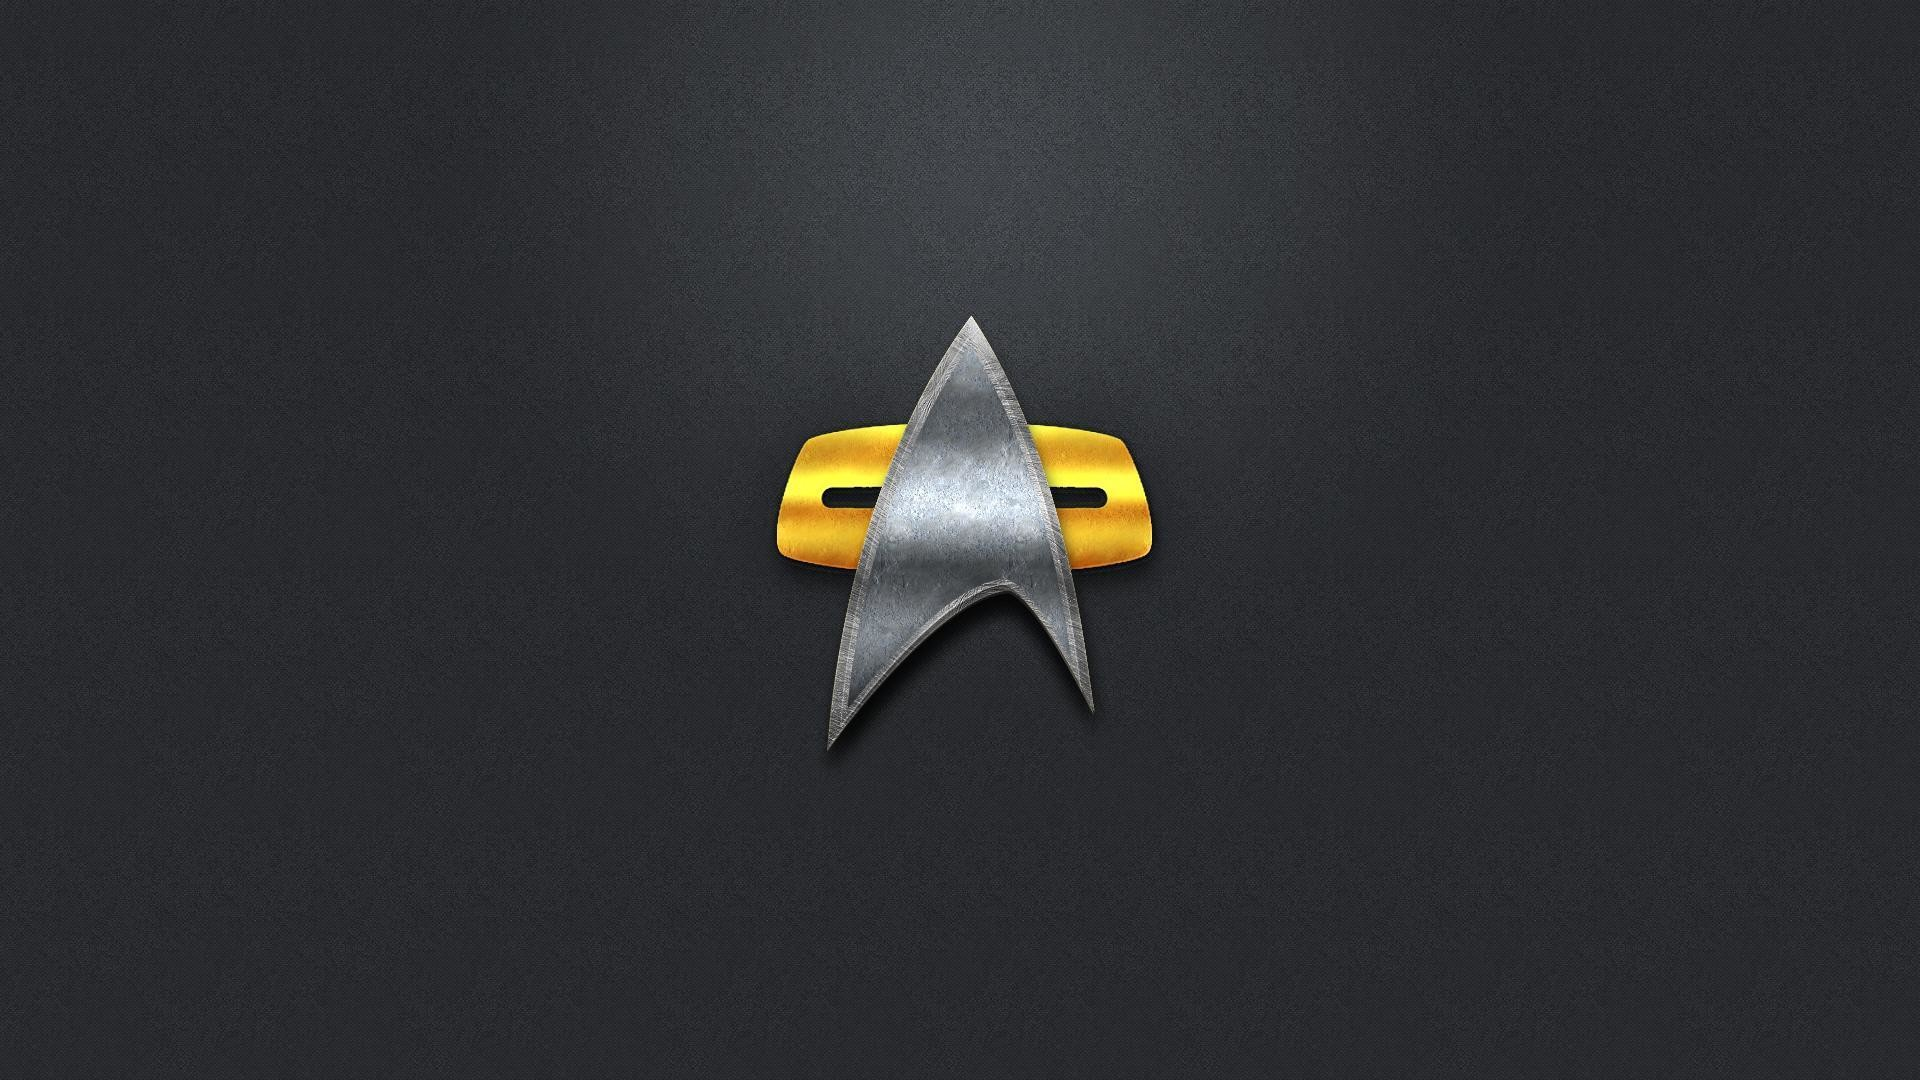 Logos For > Star Trek Insignia Wallpaper Hd